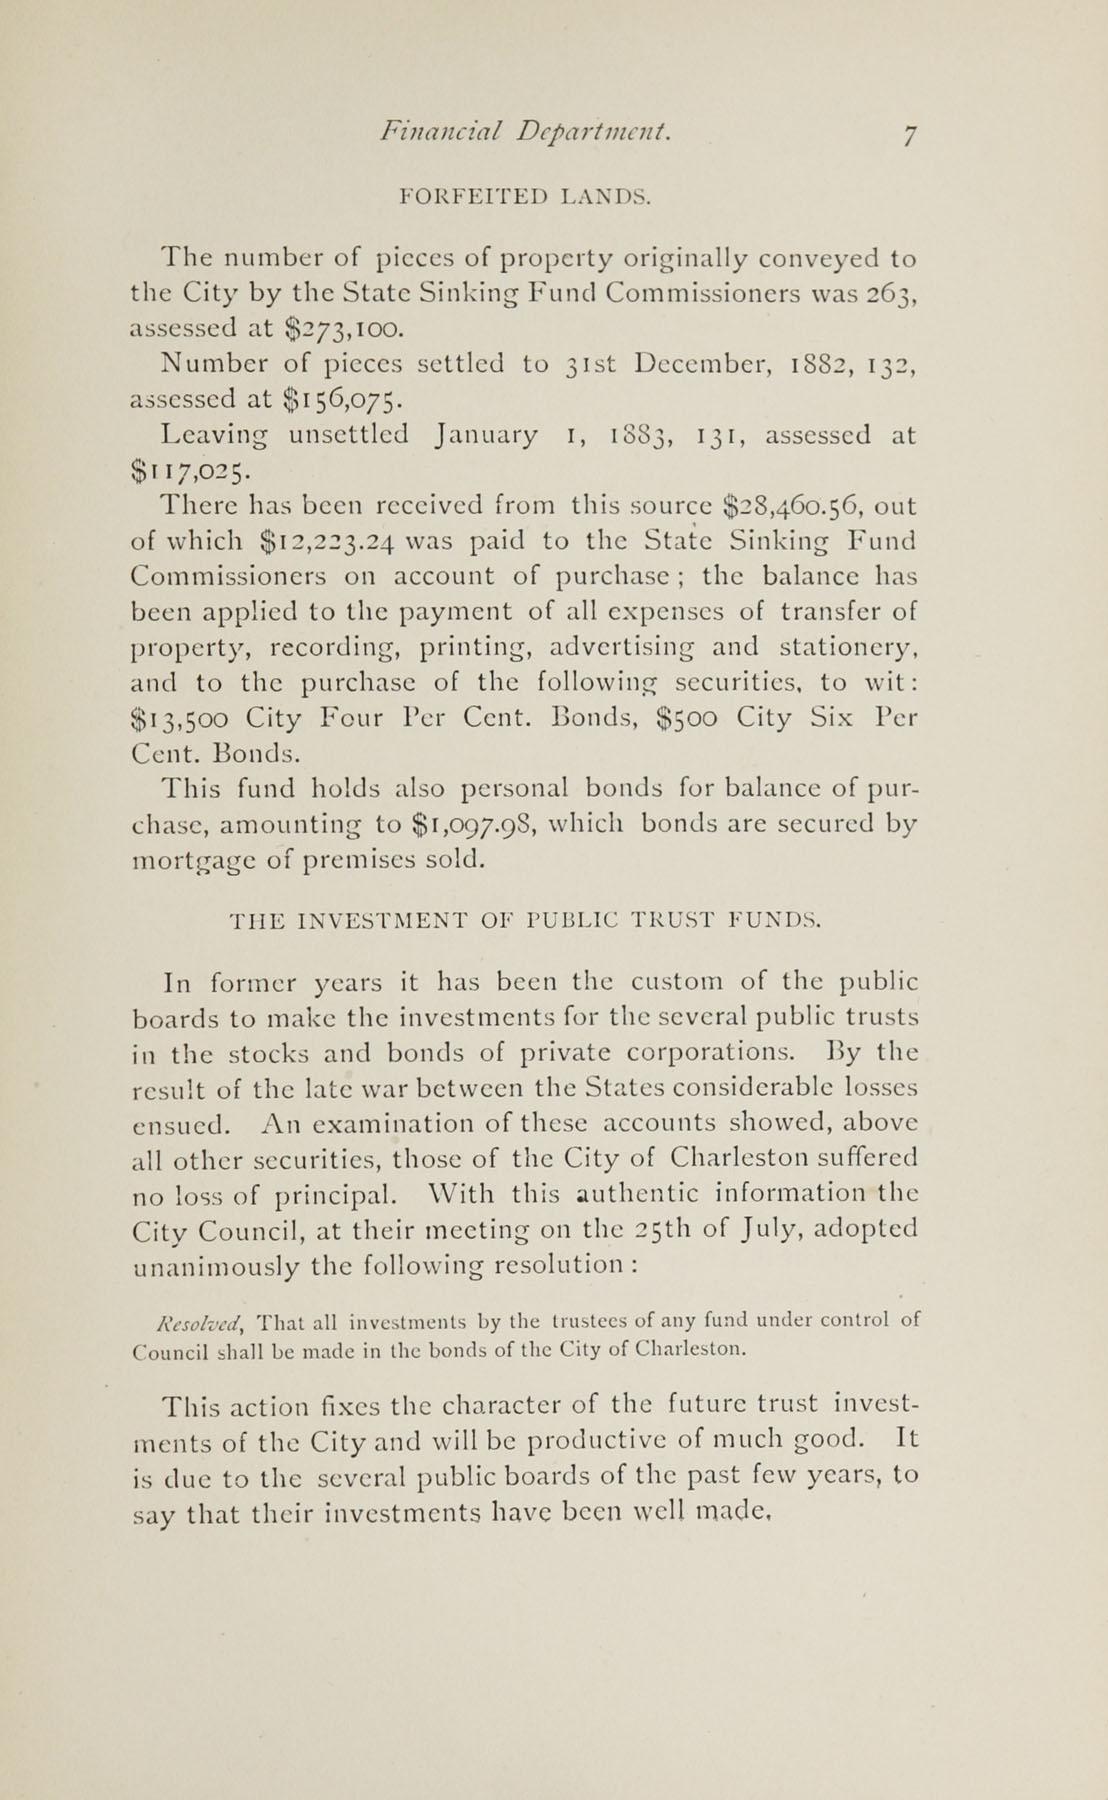 Charleston Yearbook, 1882, page 7